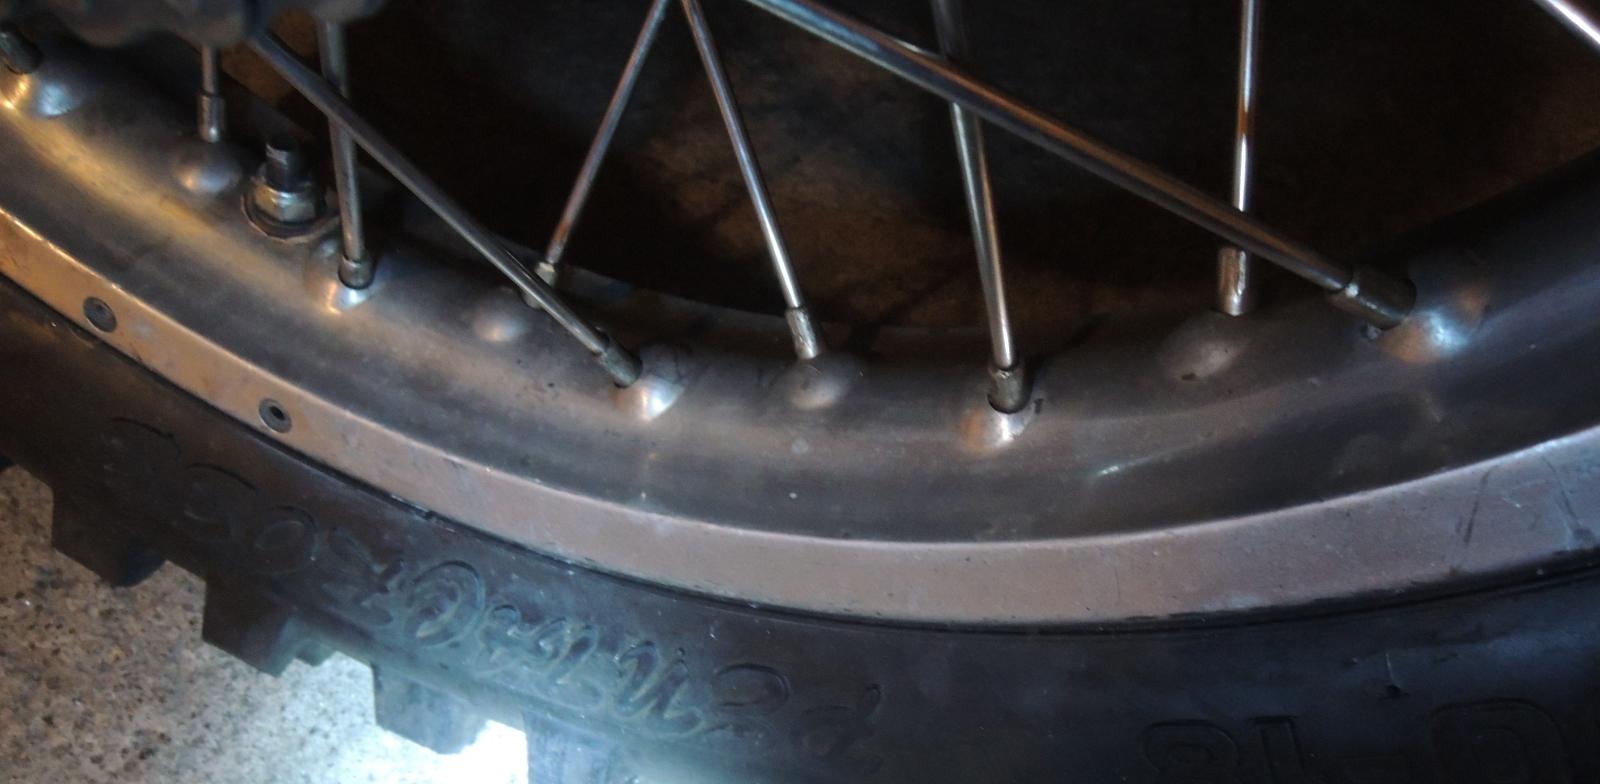 Bultaco Frontera Gold Medal 250 - By Jorok - Página 2 24fimmt